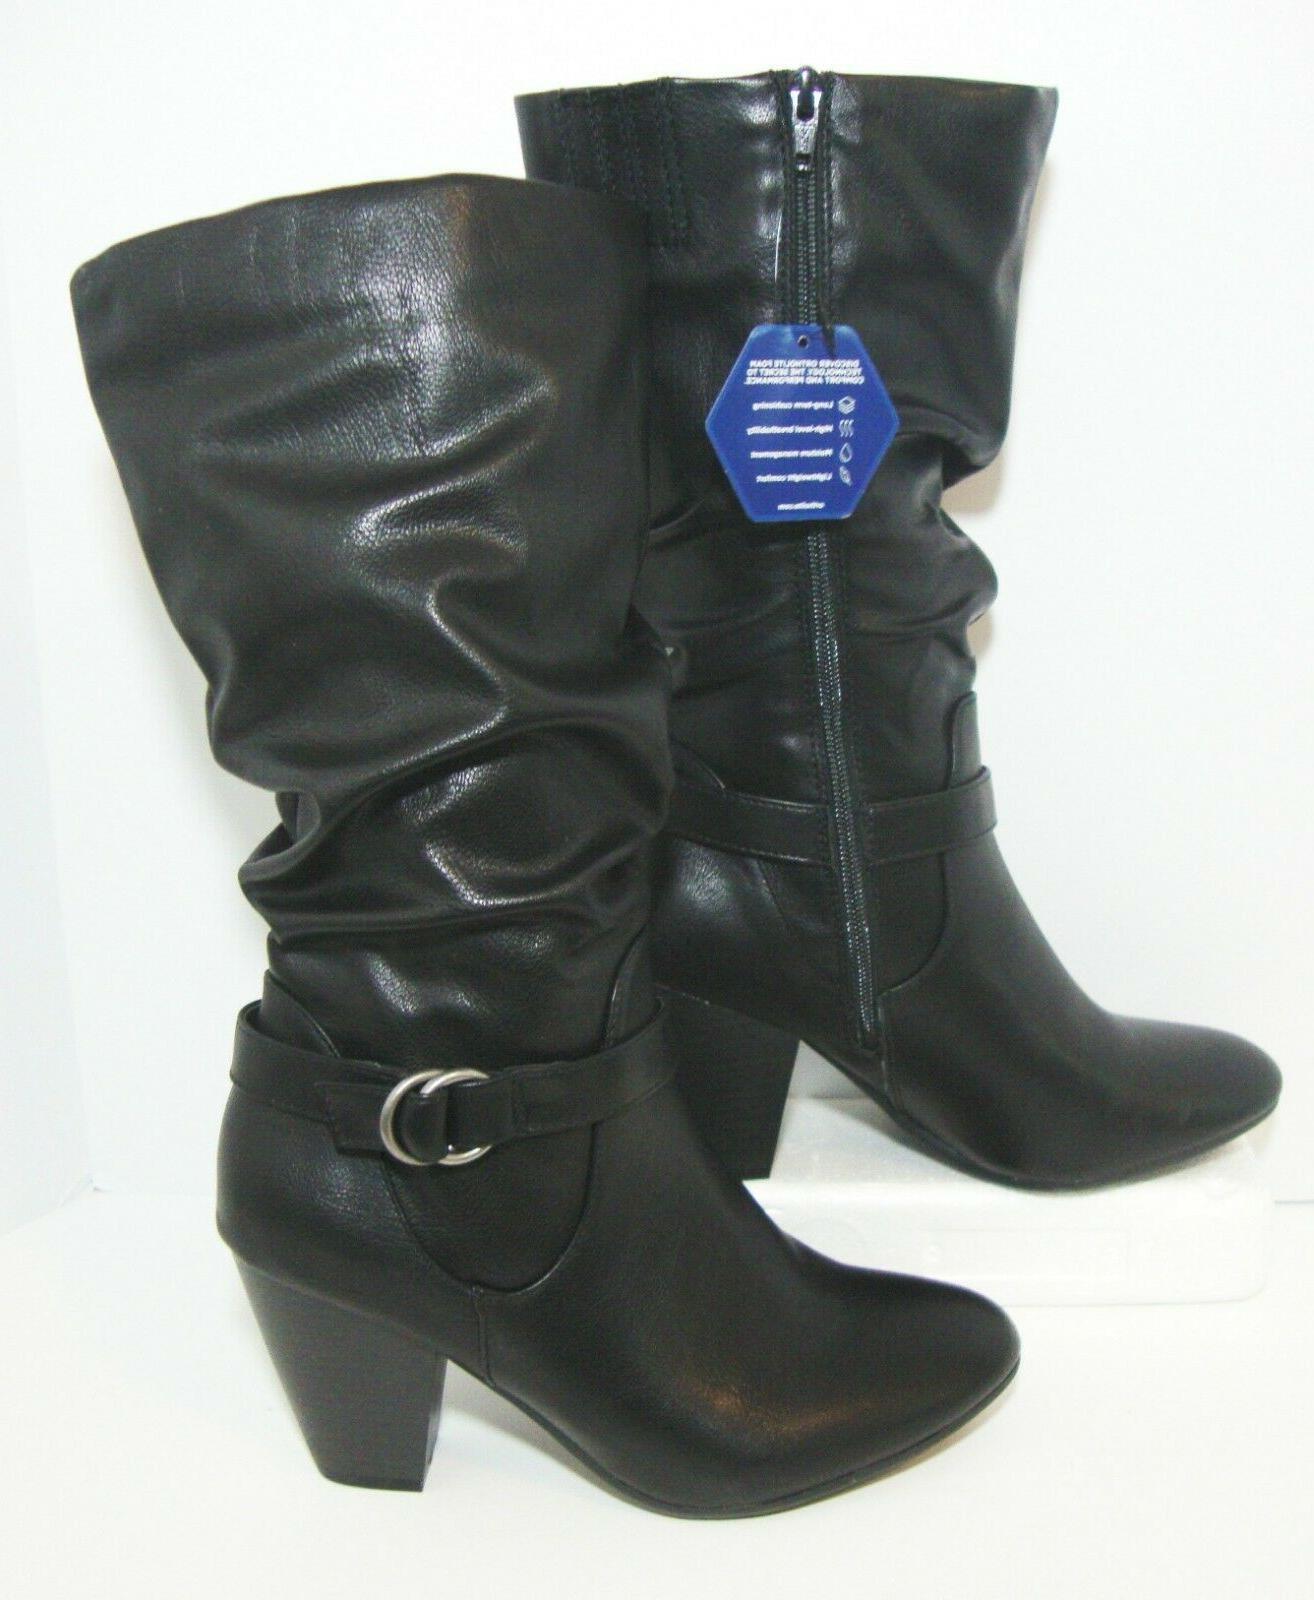 calf high black motorcycle boots comfort soles